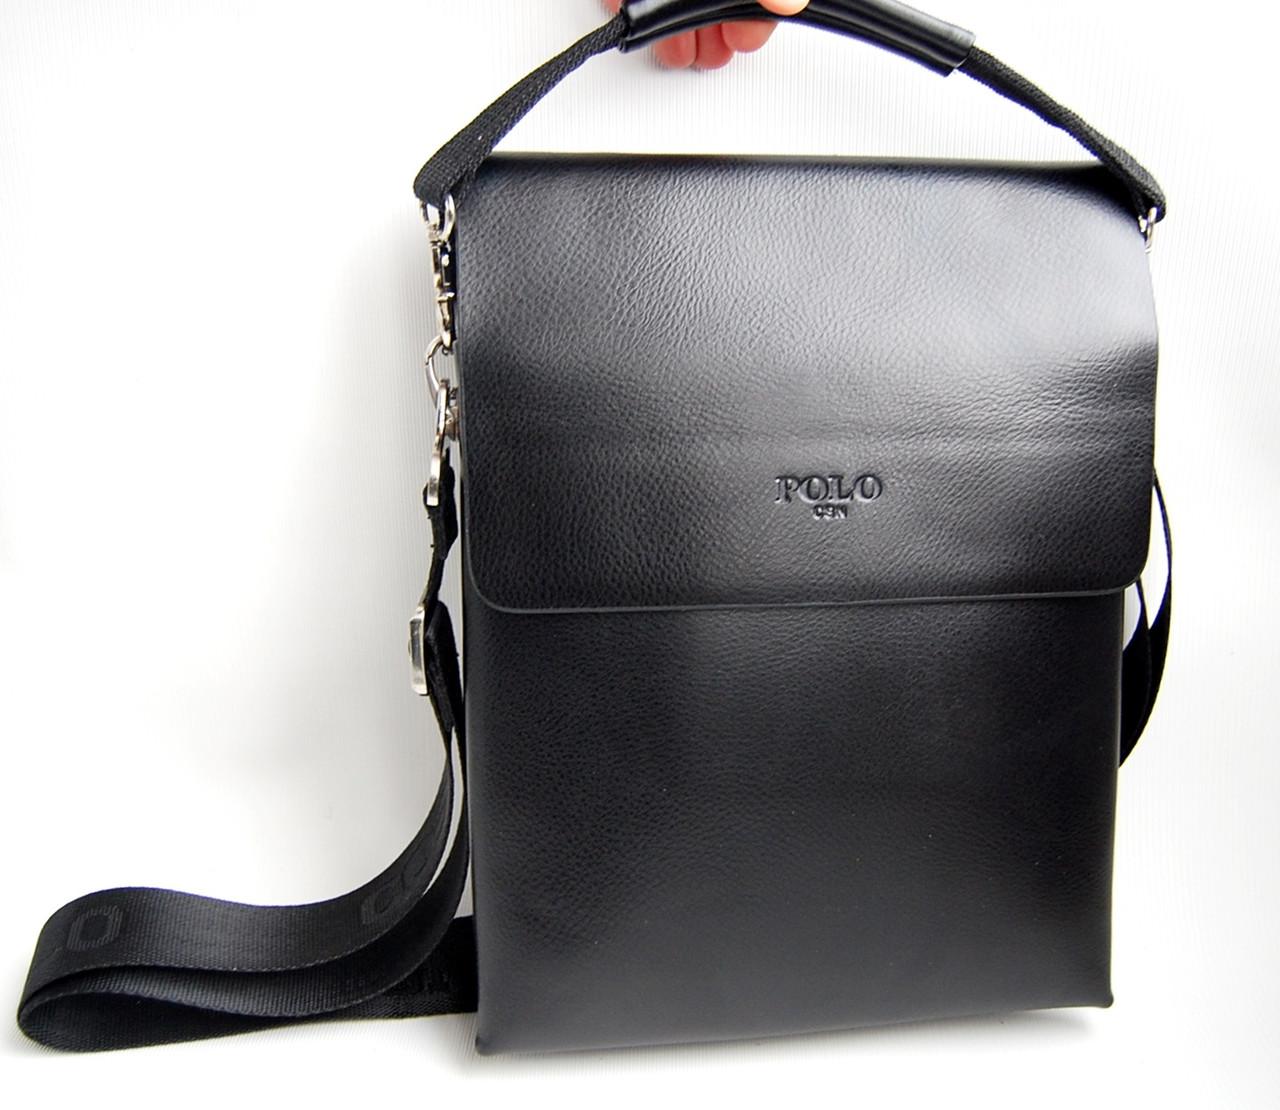 353966a8f34a Мужская сумка-планшет Polo 9880-3 с ручкой КС31 - интернет-магазин